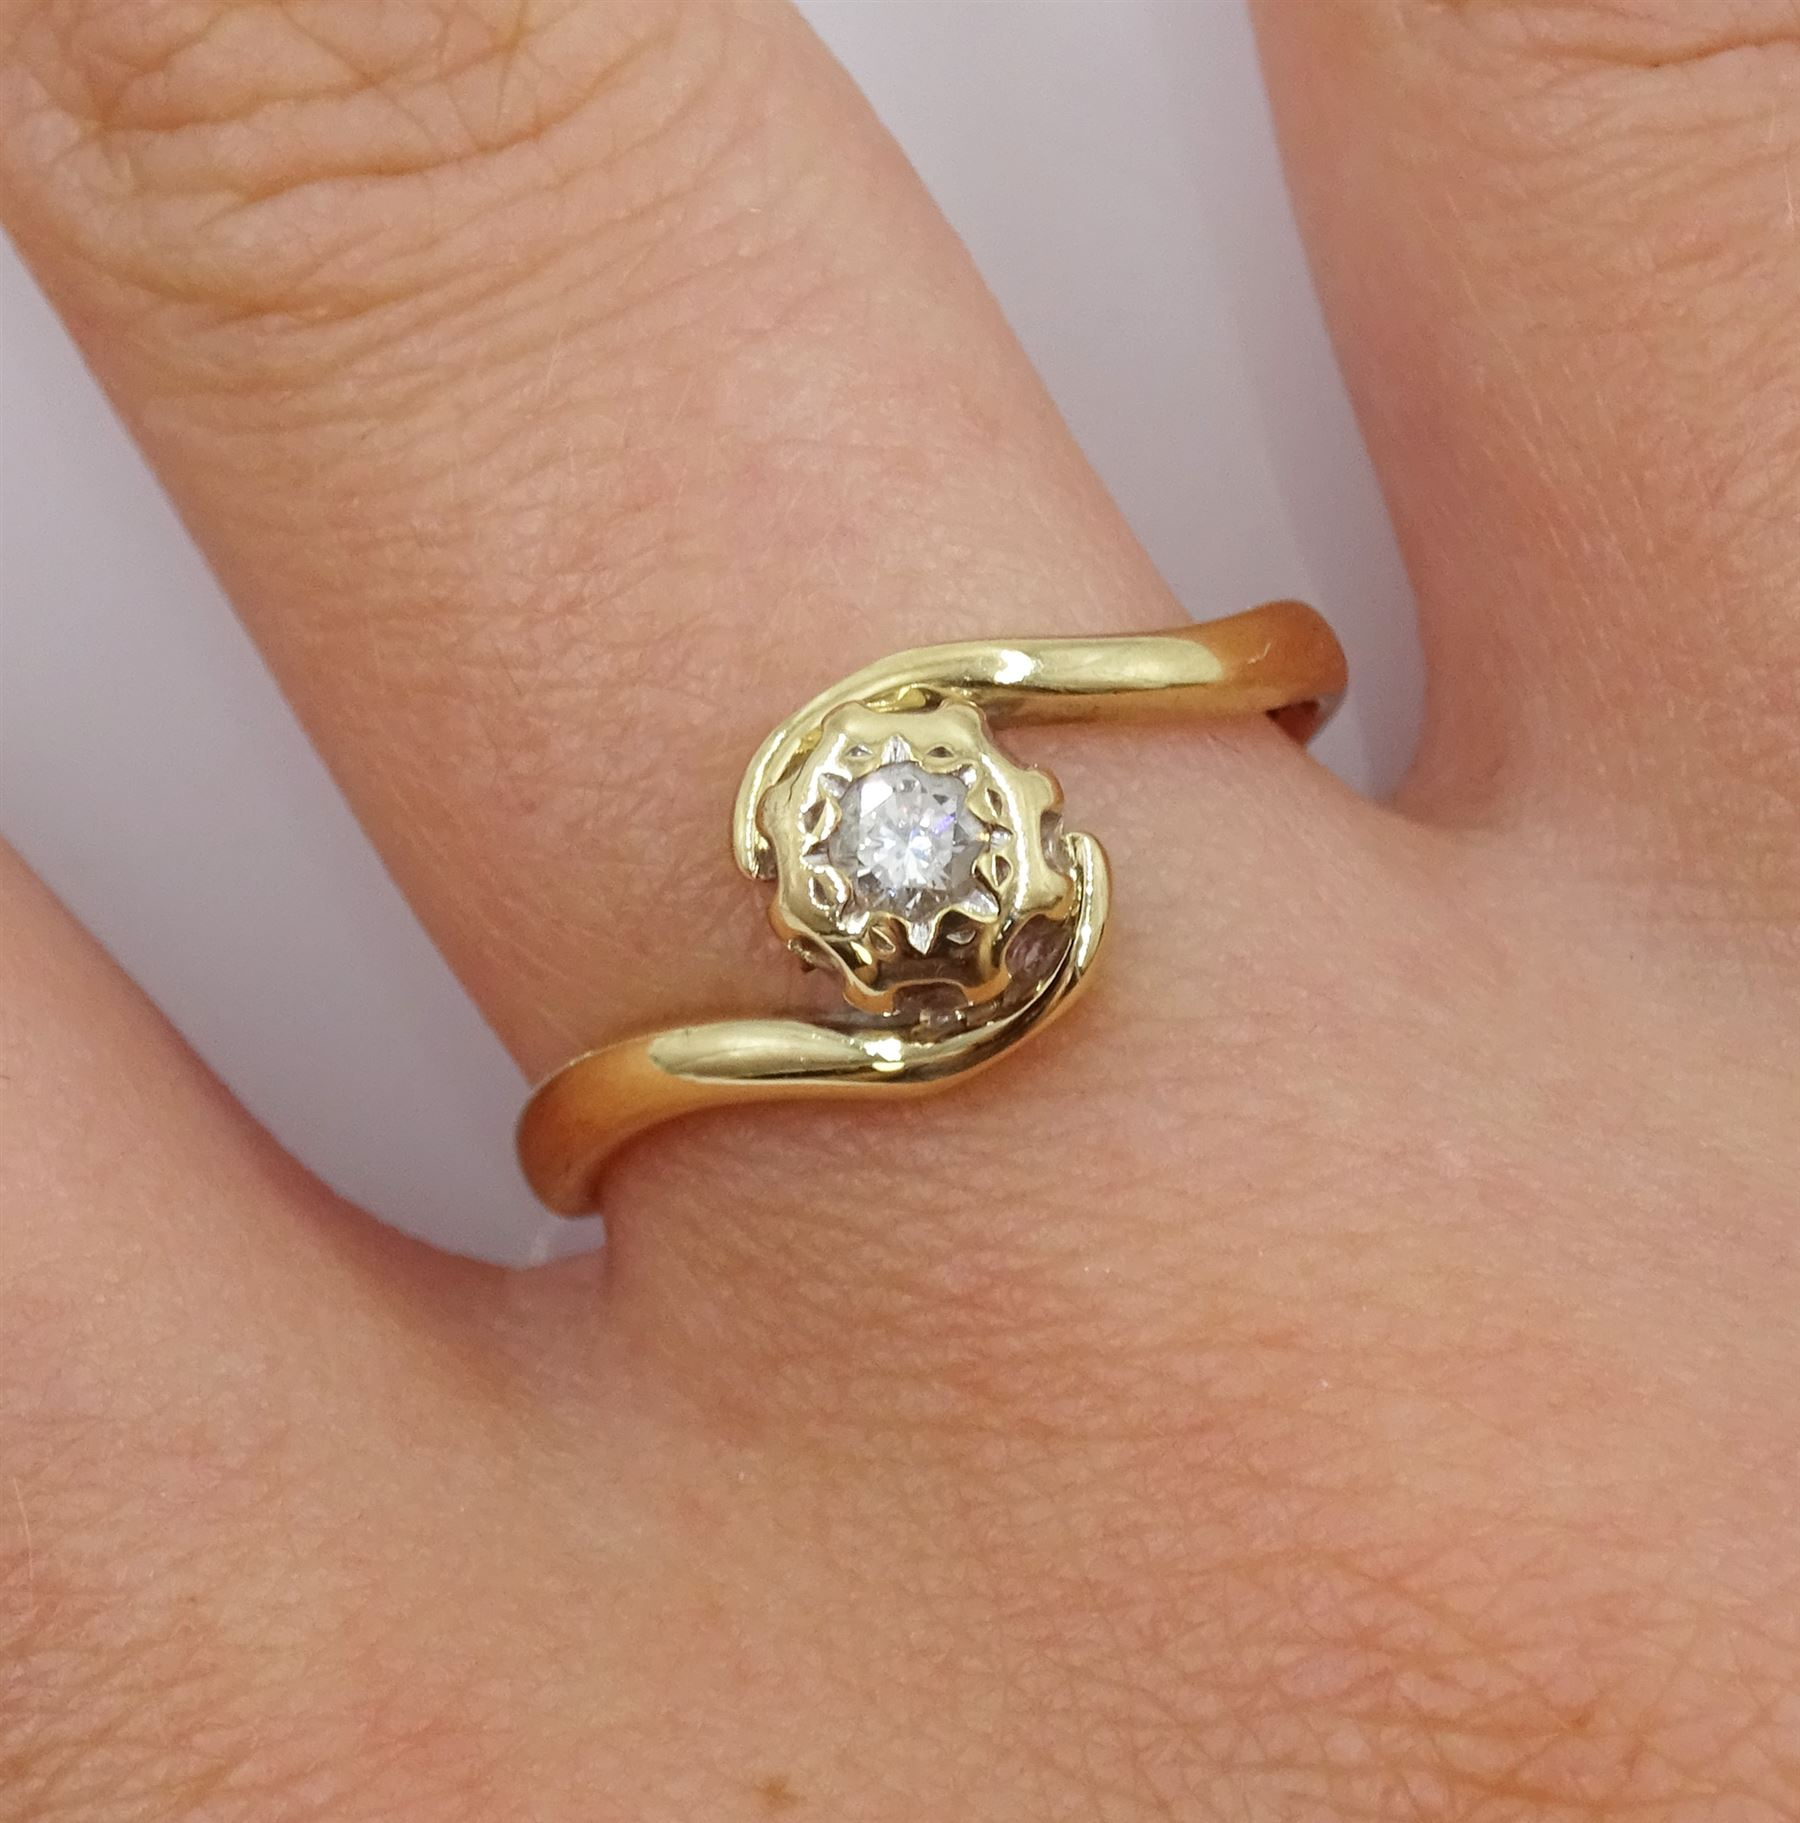 9ct gold single stone diamond ring - Image 2 of 4